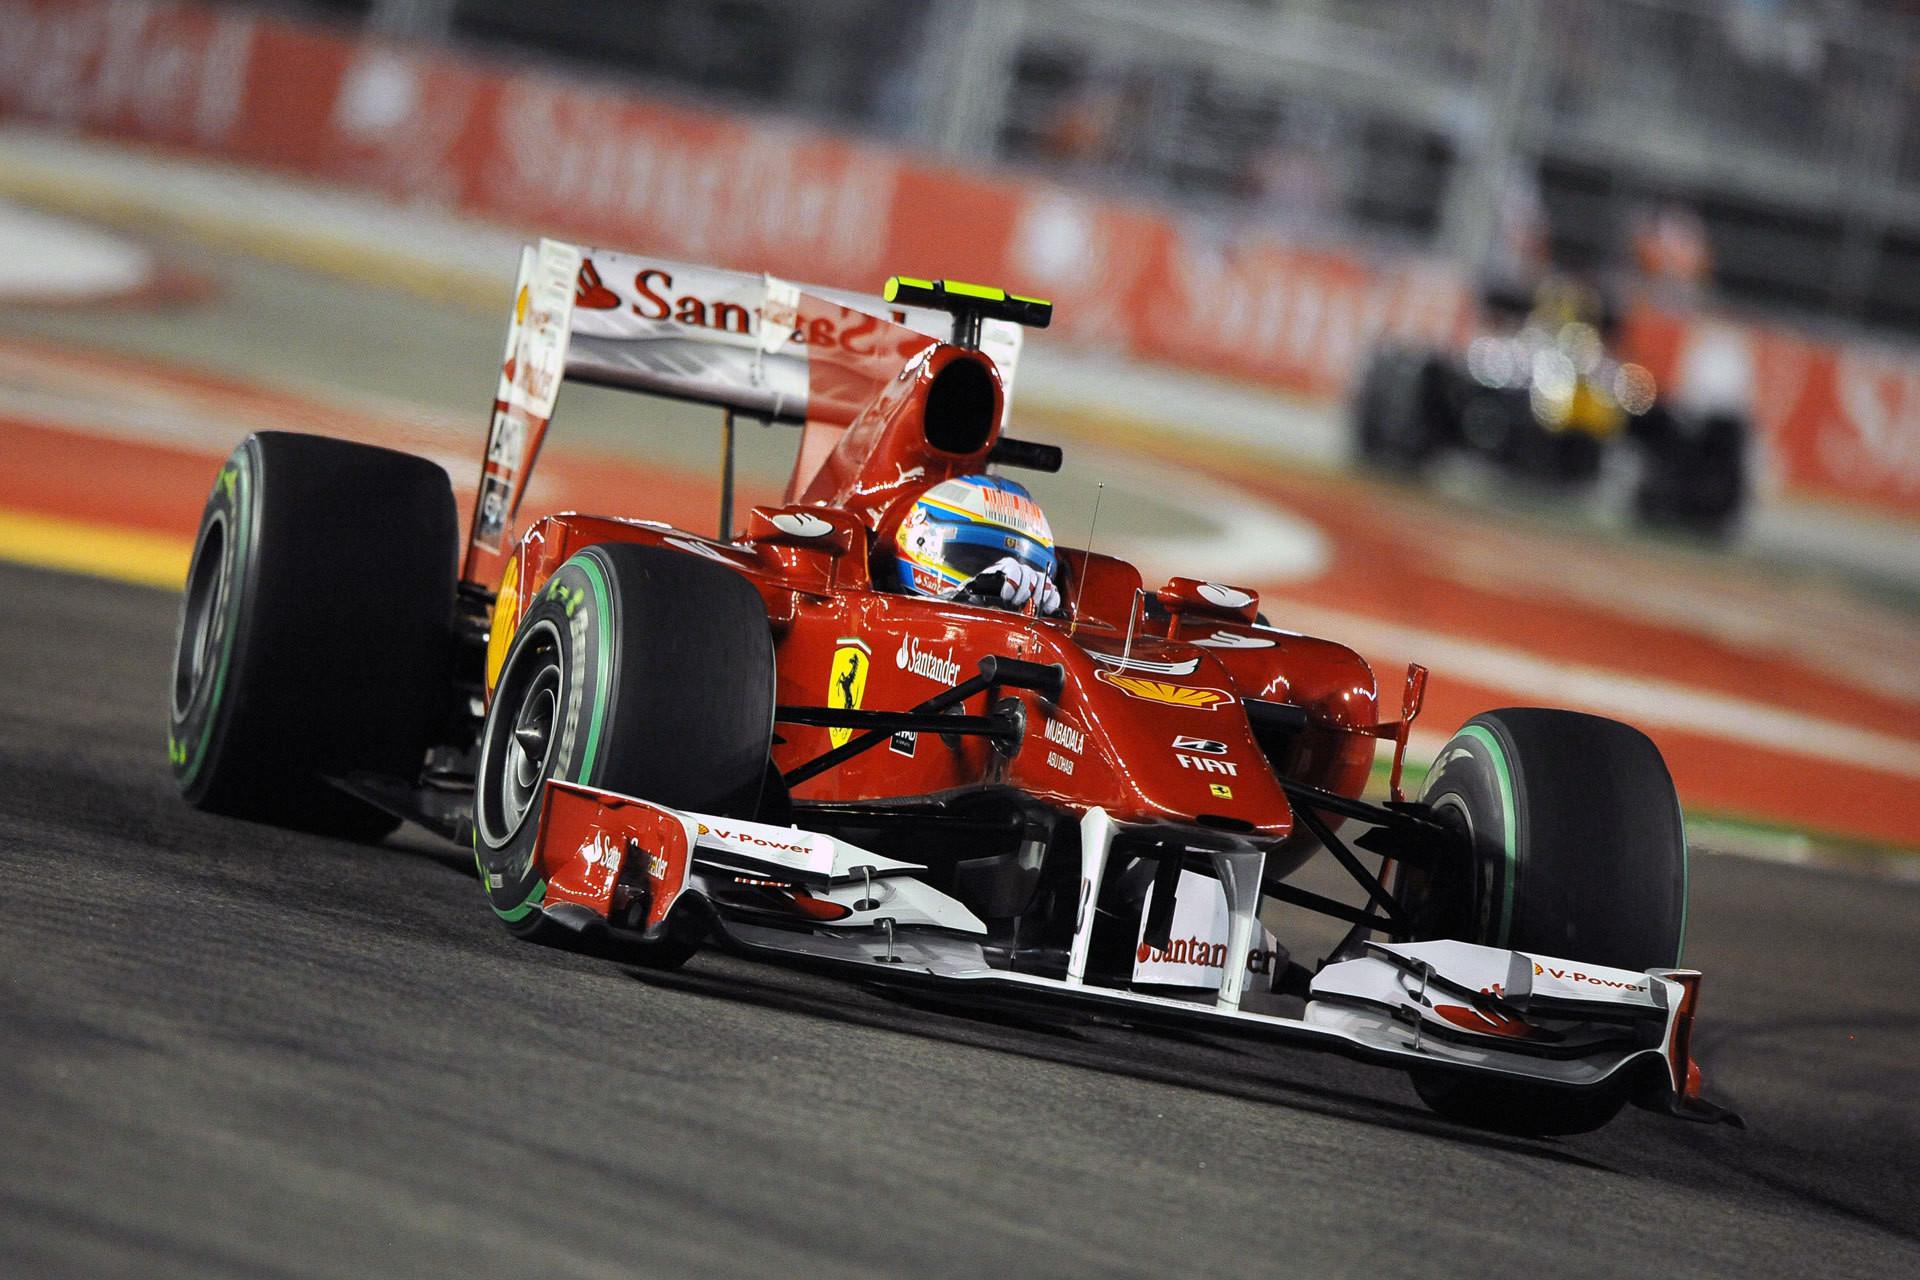 Vettel Ferrari HD desktop wallpaper Widescreen High · Formula 1Iphone …